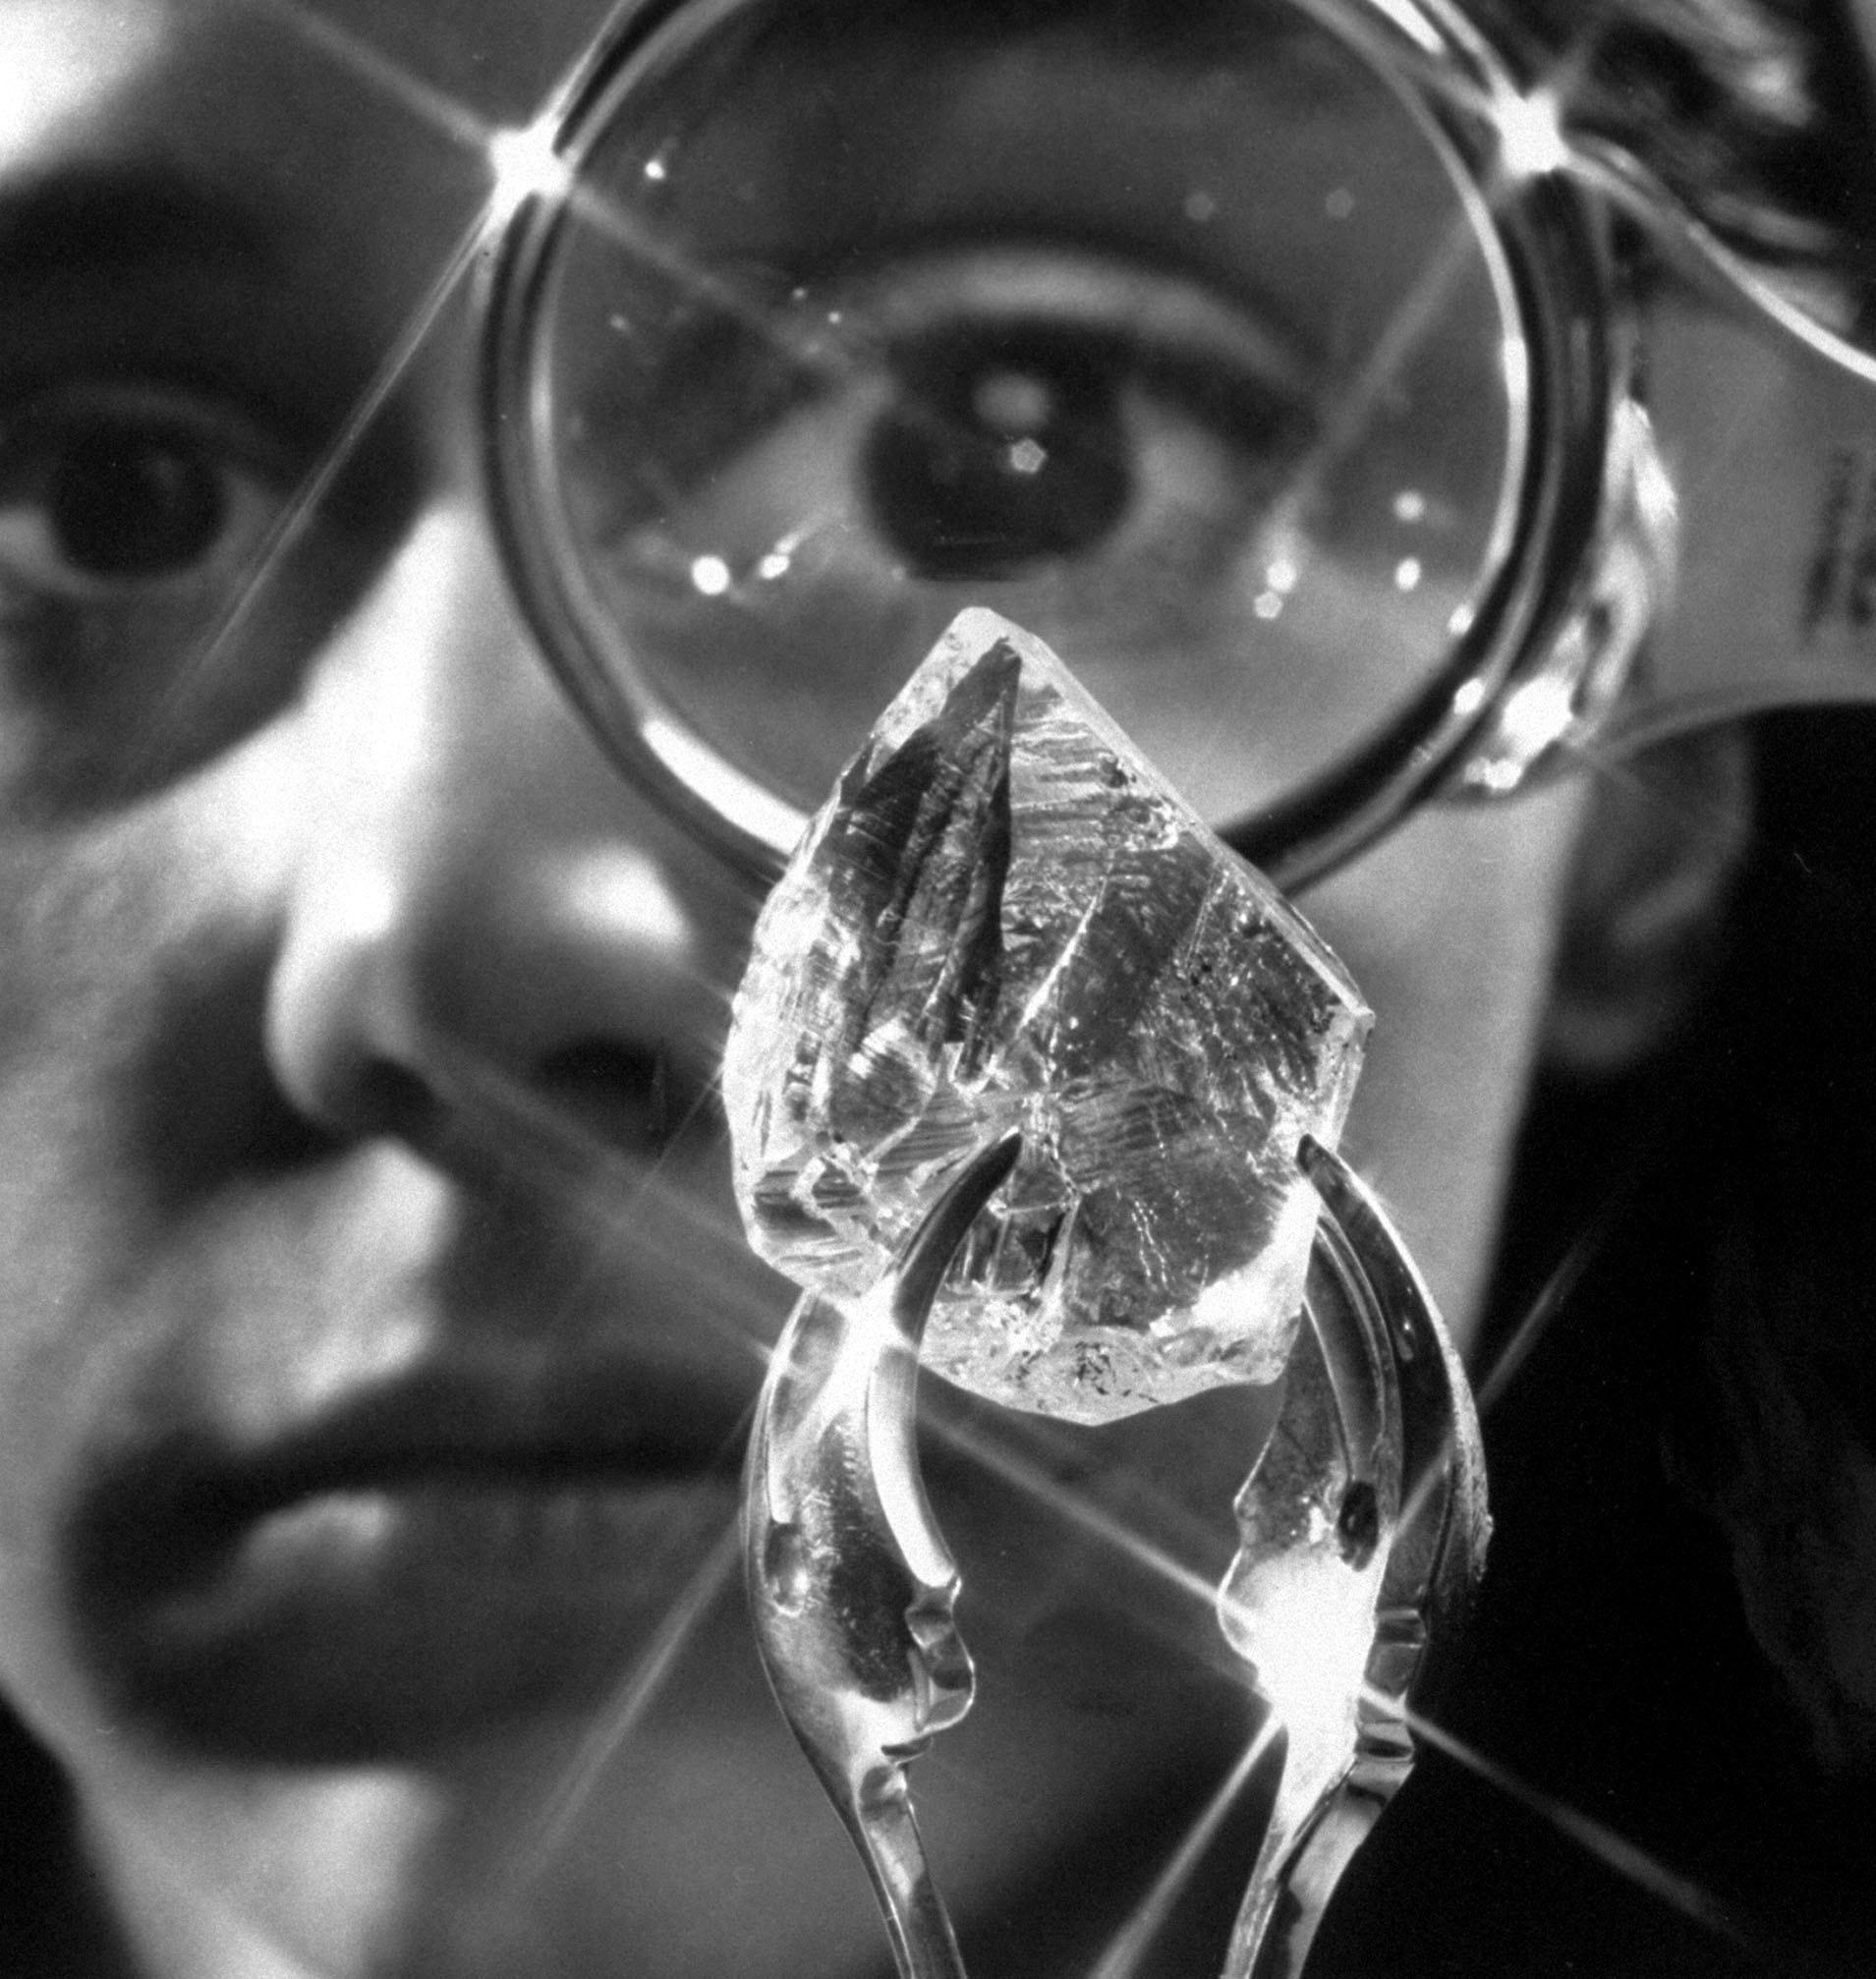 An 80-carat uncut diamond from Tiffany's, seen in 1969.